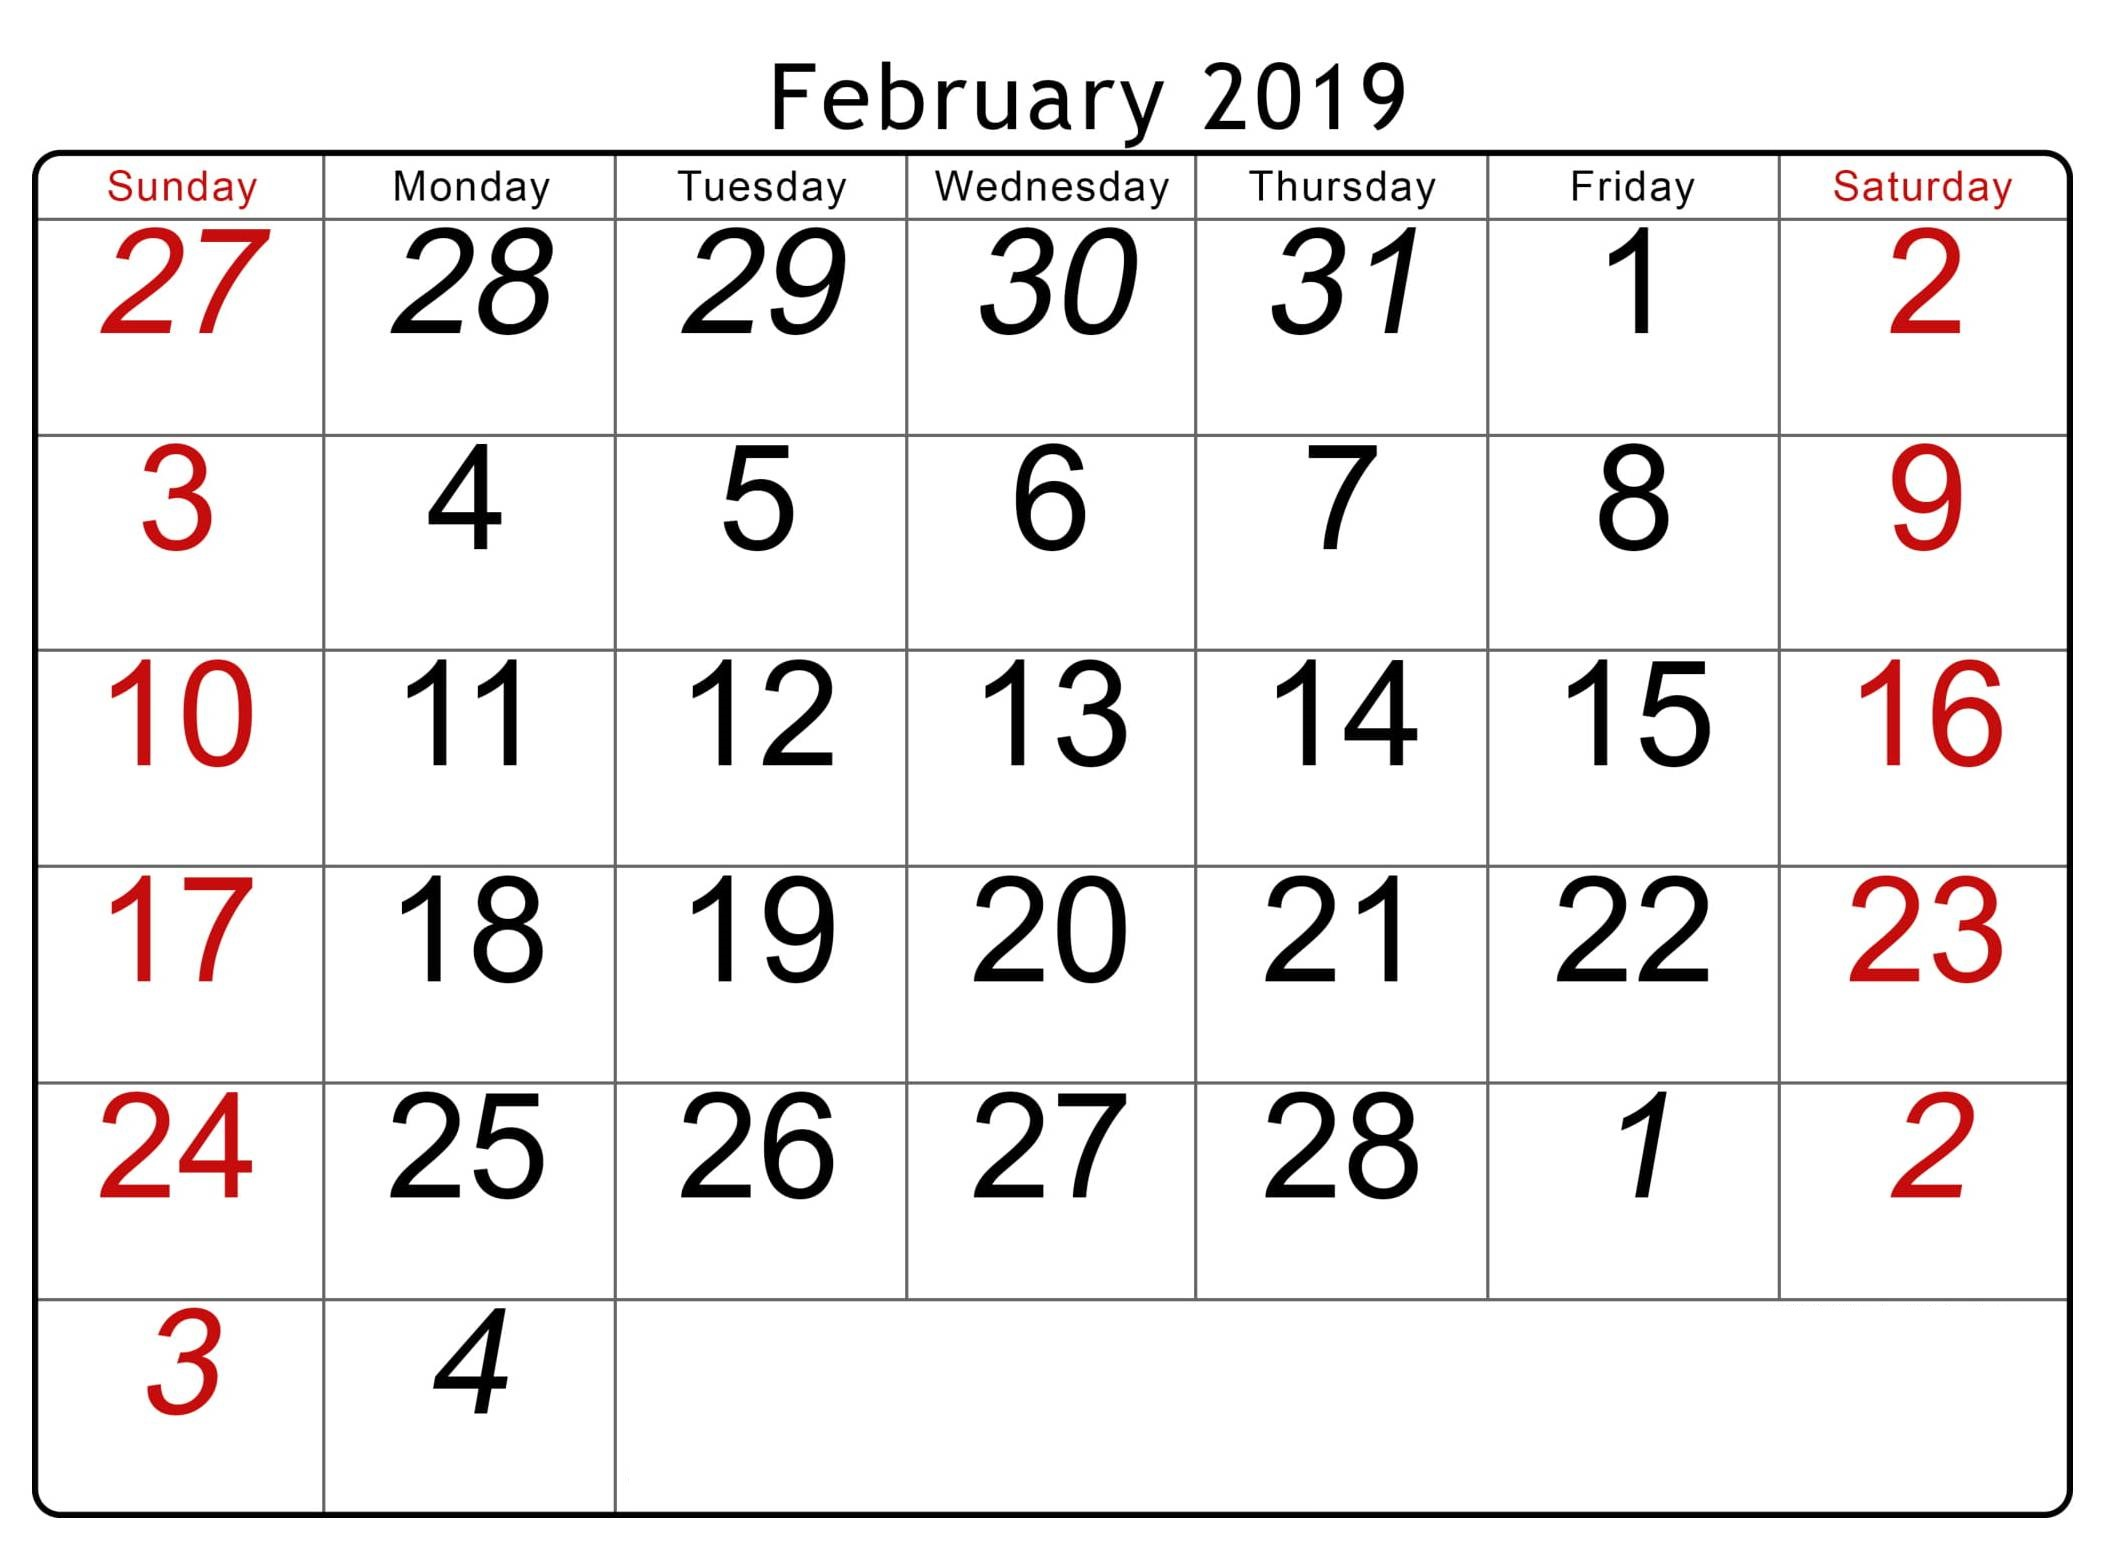 February 2019 Calendar Xls